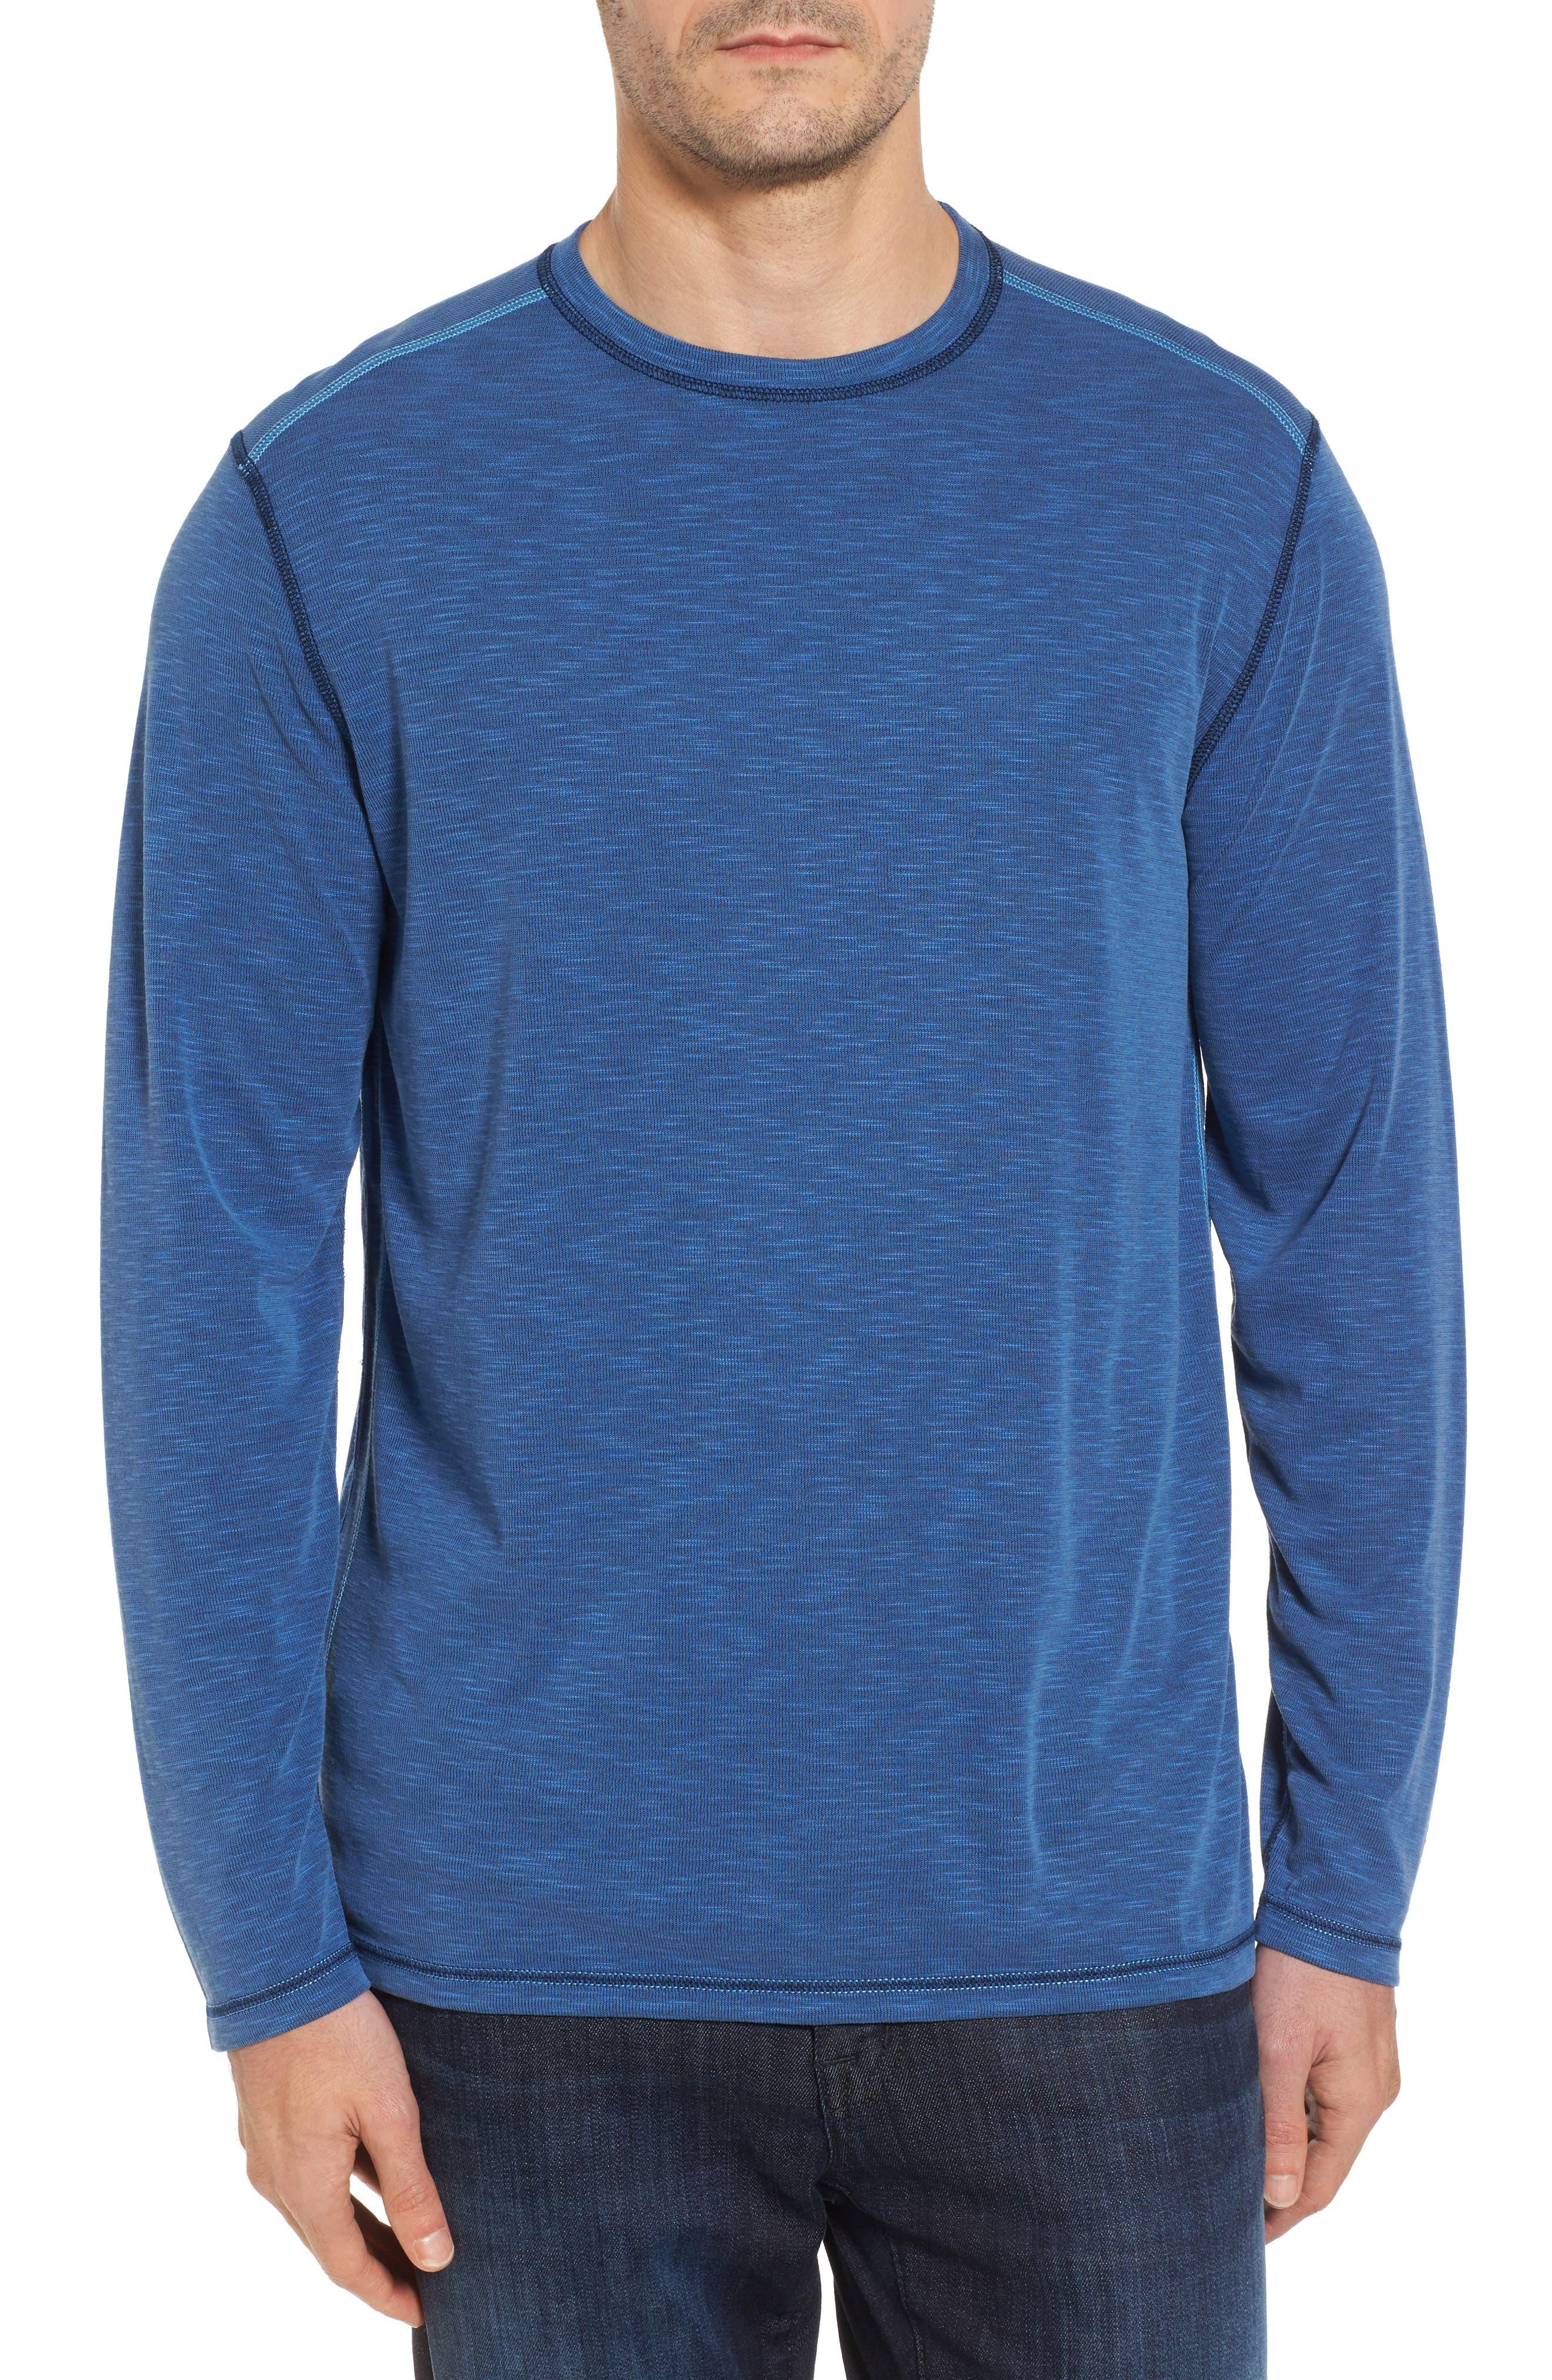 Flip Tide Standard Fit T-Shirt,                             Main thumbnail 1, color,                             GALAXY BLUE